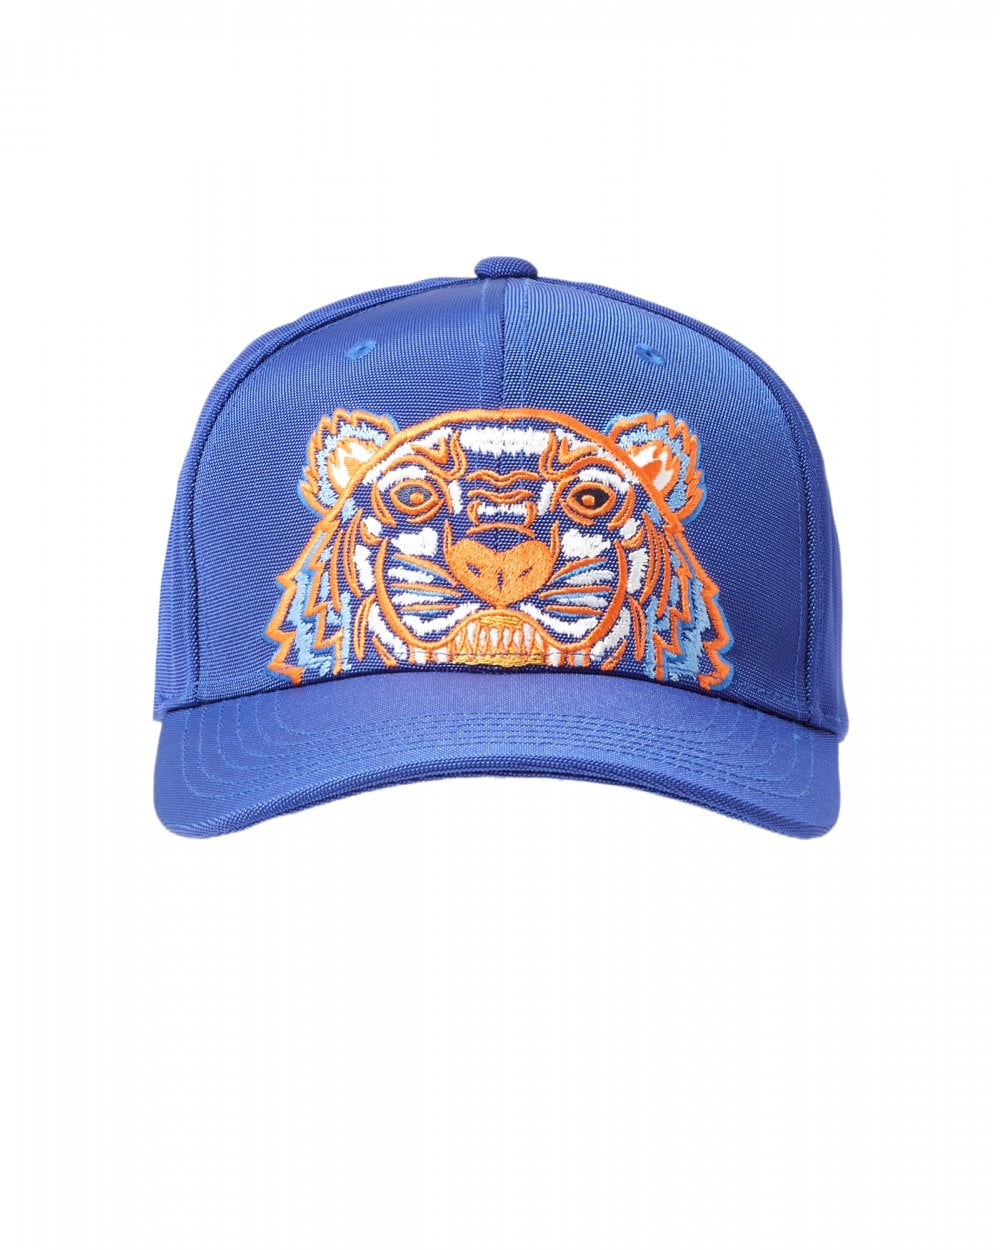 3a8f646ff Mens Canvas Tiger Cap, French Blue Hat